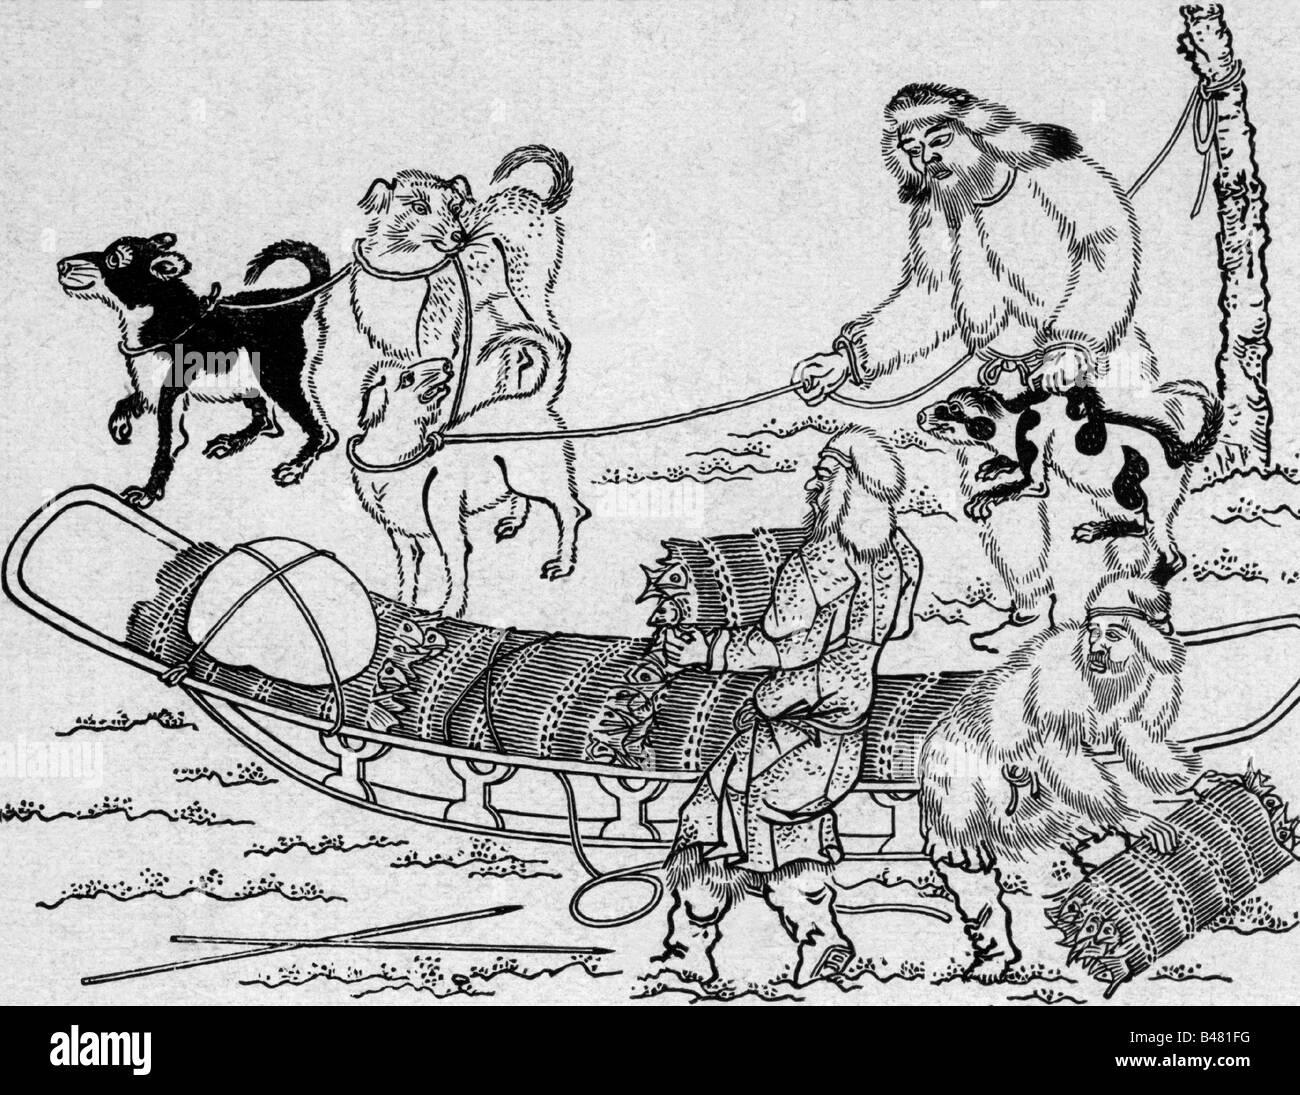 geography / travel, Japan, people, Ainu with dogsled, Japanese woodcut, traffic, sled, dogs, dog, animal, winter, - Stock Image